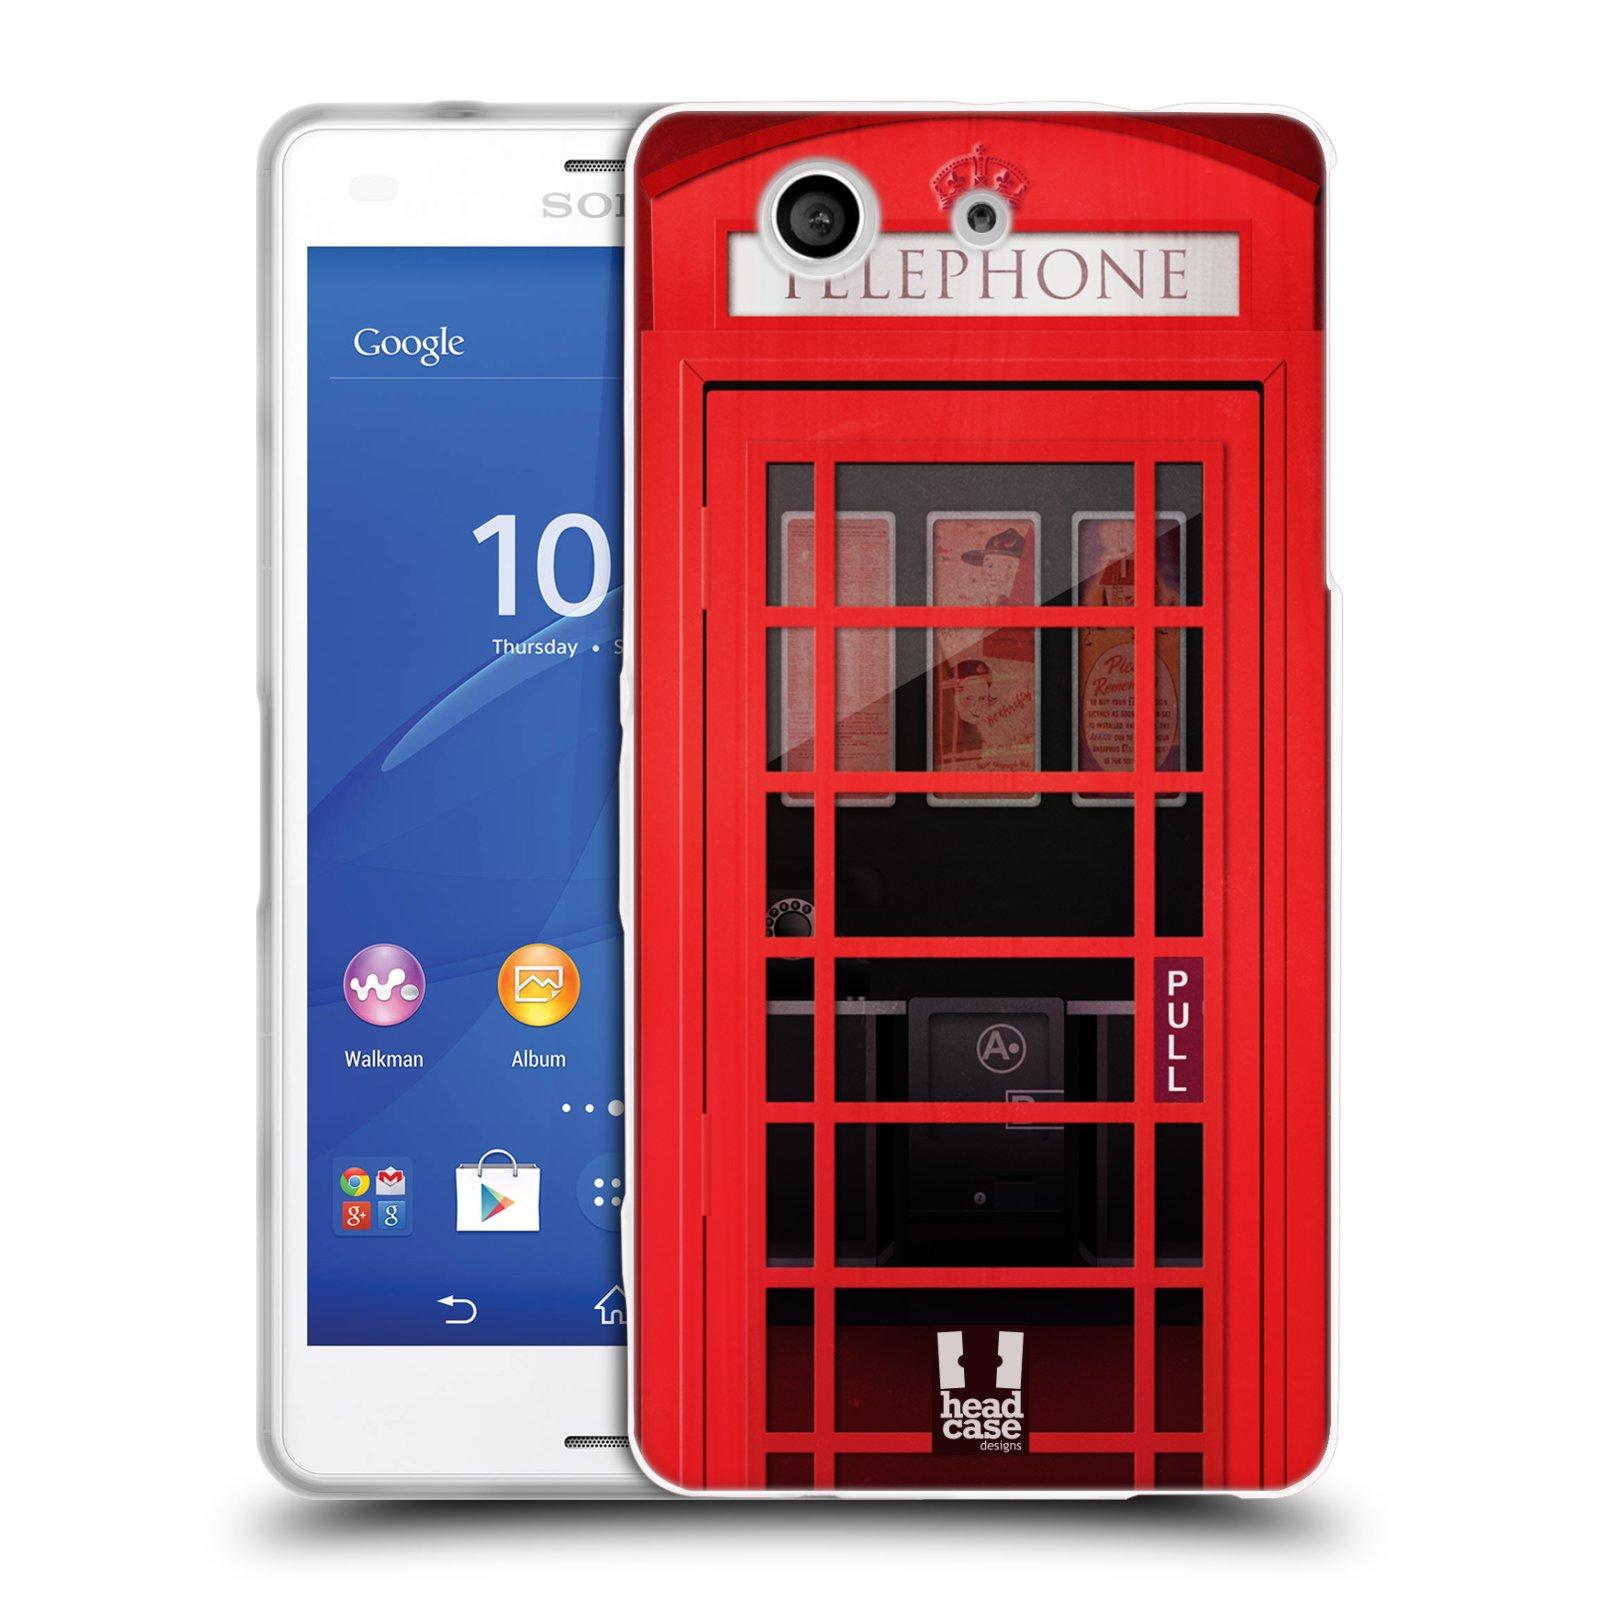 Silikonové pouzdro na mobil Sony Xperia Z3 Compact D5803 HEAD CASE TELEFONNÍ BUDKA